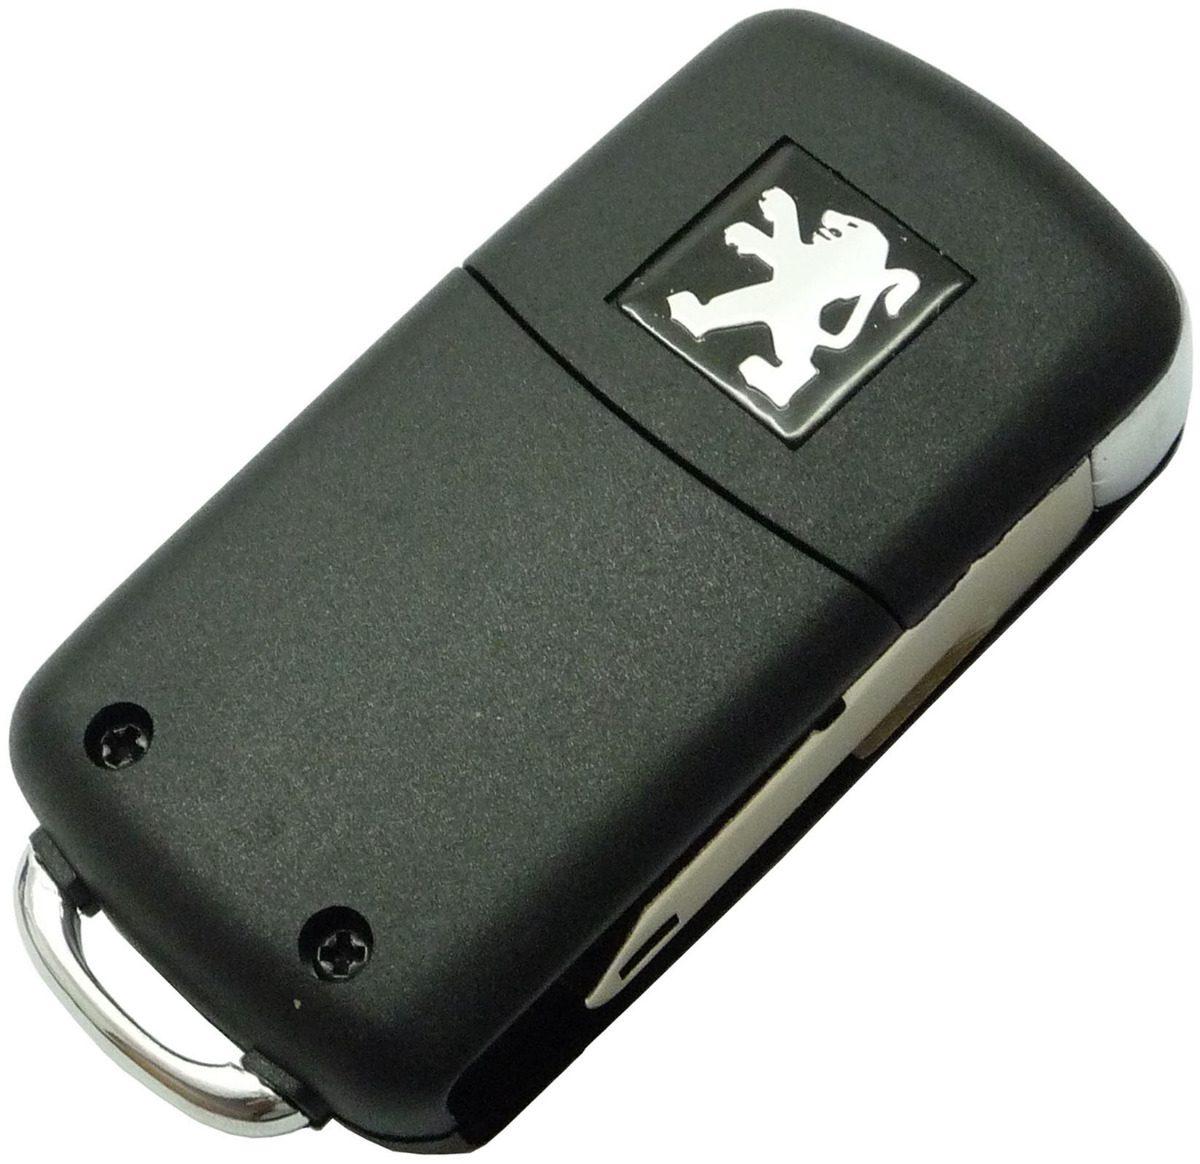 Chave Canivete Peugeot Para Telecomando 206 , 207 , Hoggar